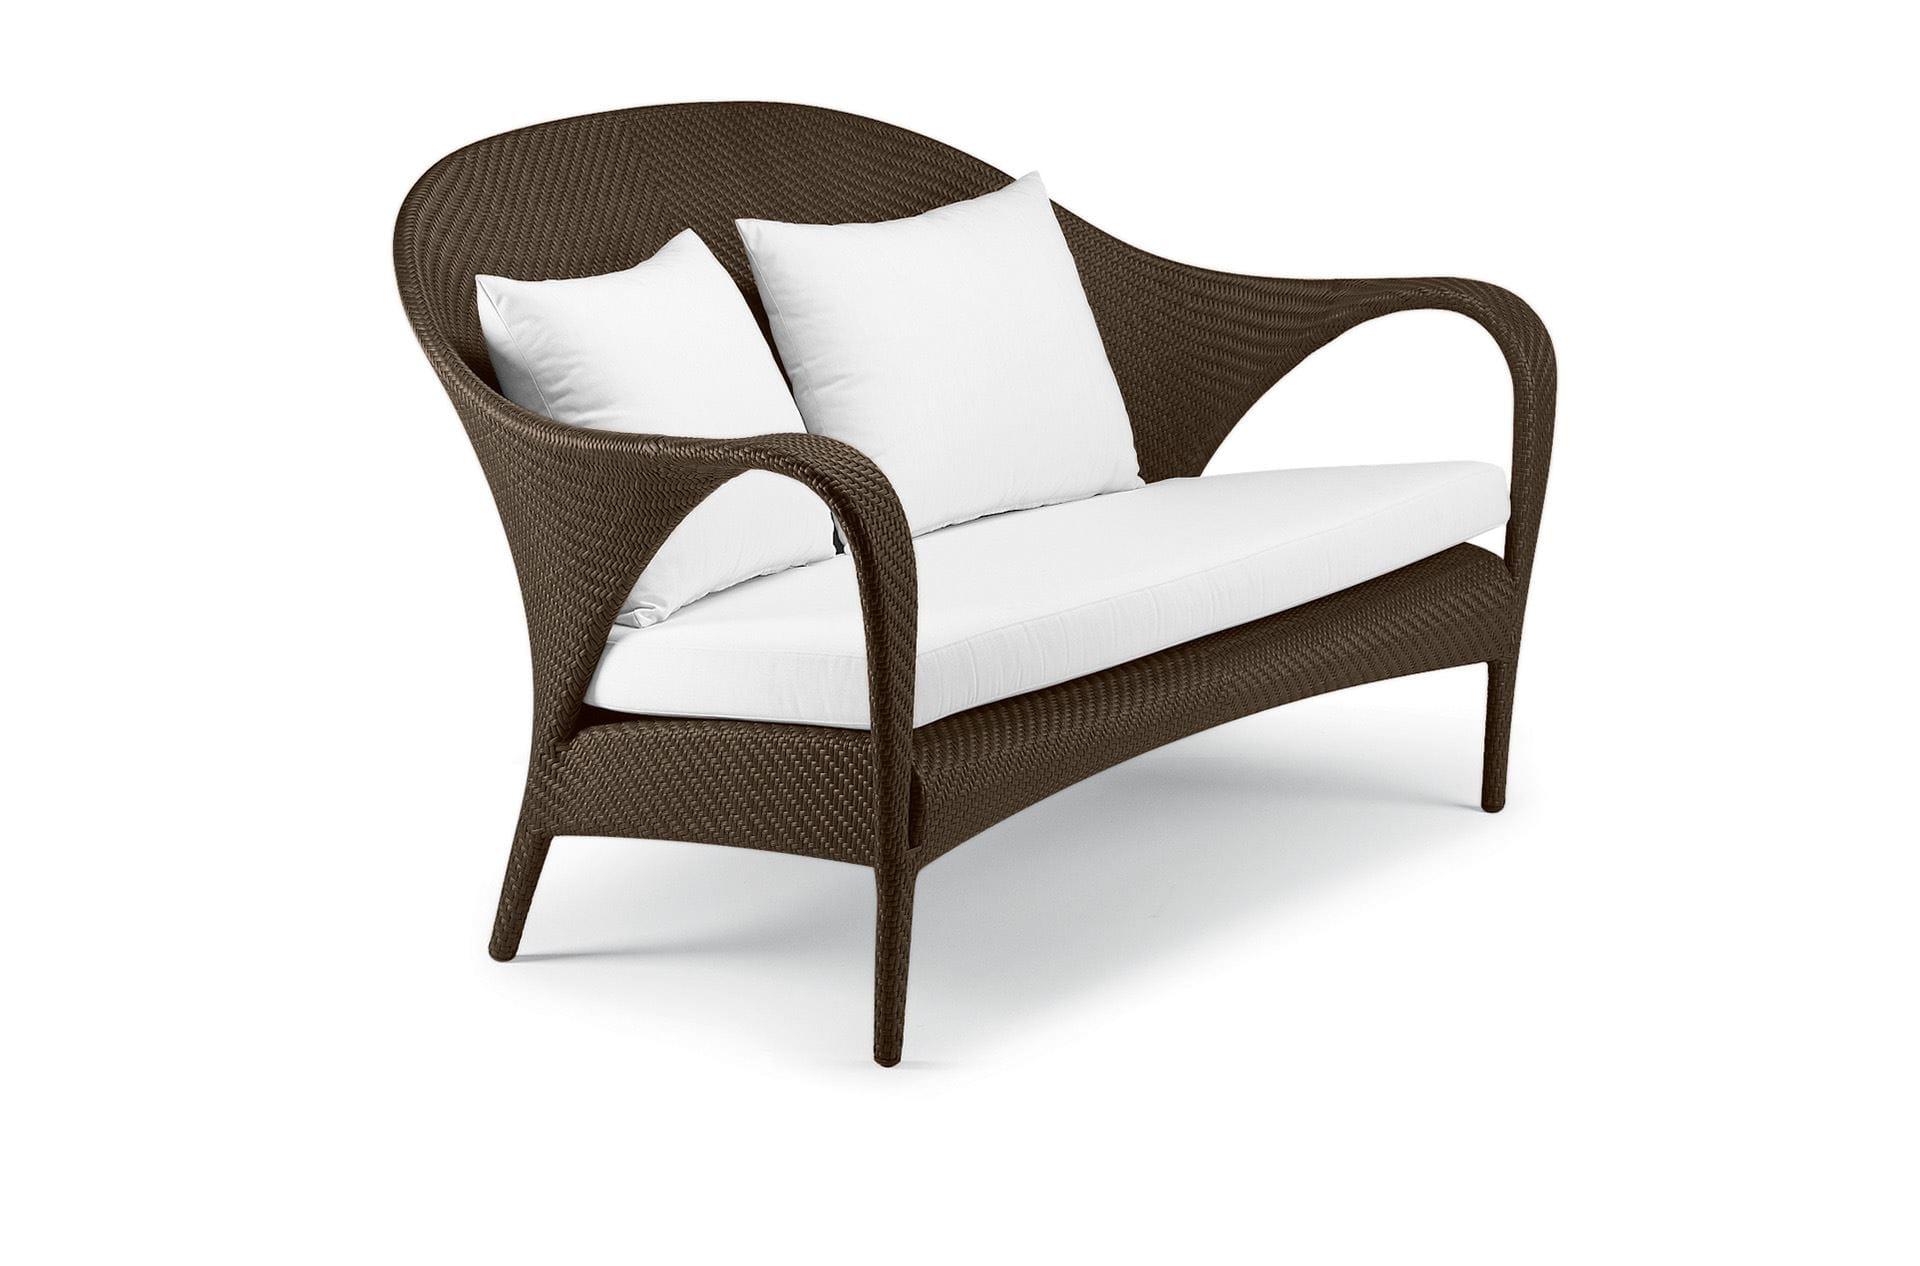 Dedon Garden Furniture Sale Outdoor Ebay Australia Home Design Armchair